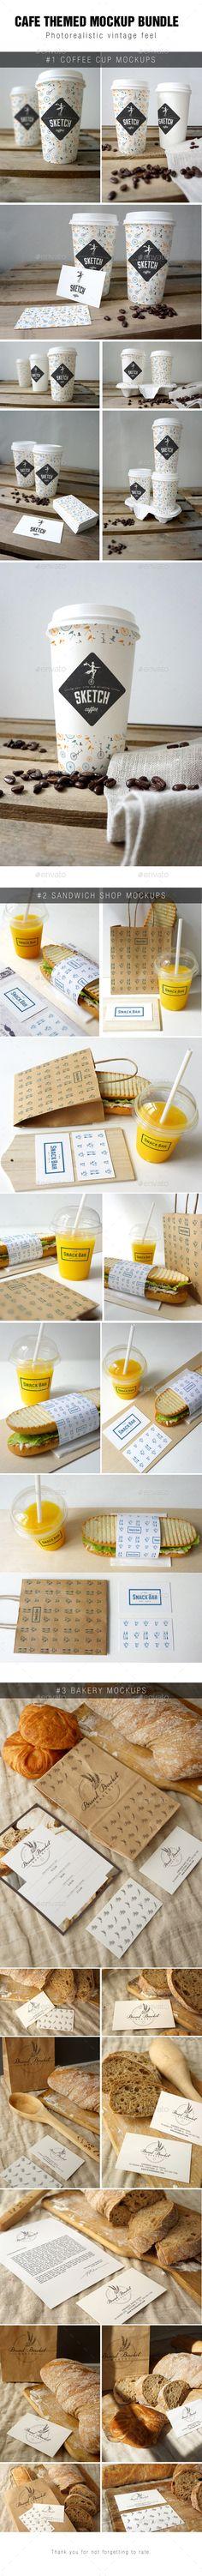 Cafe Branding Mockup Bundle | #brandingmockup #cafebrandingmockup | Download: http://graphicriver.net/item/cafe-branding-mockup-bundle/8853356?ref=ksioks